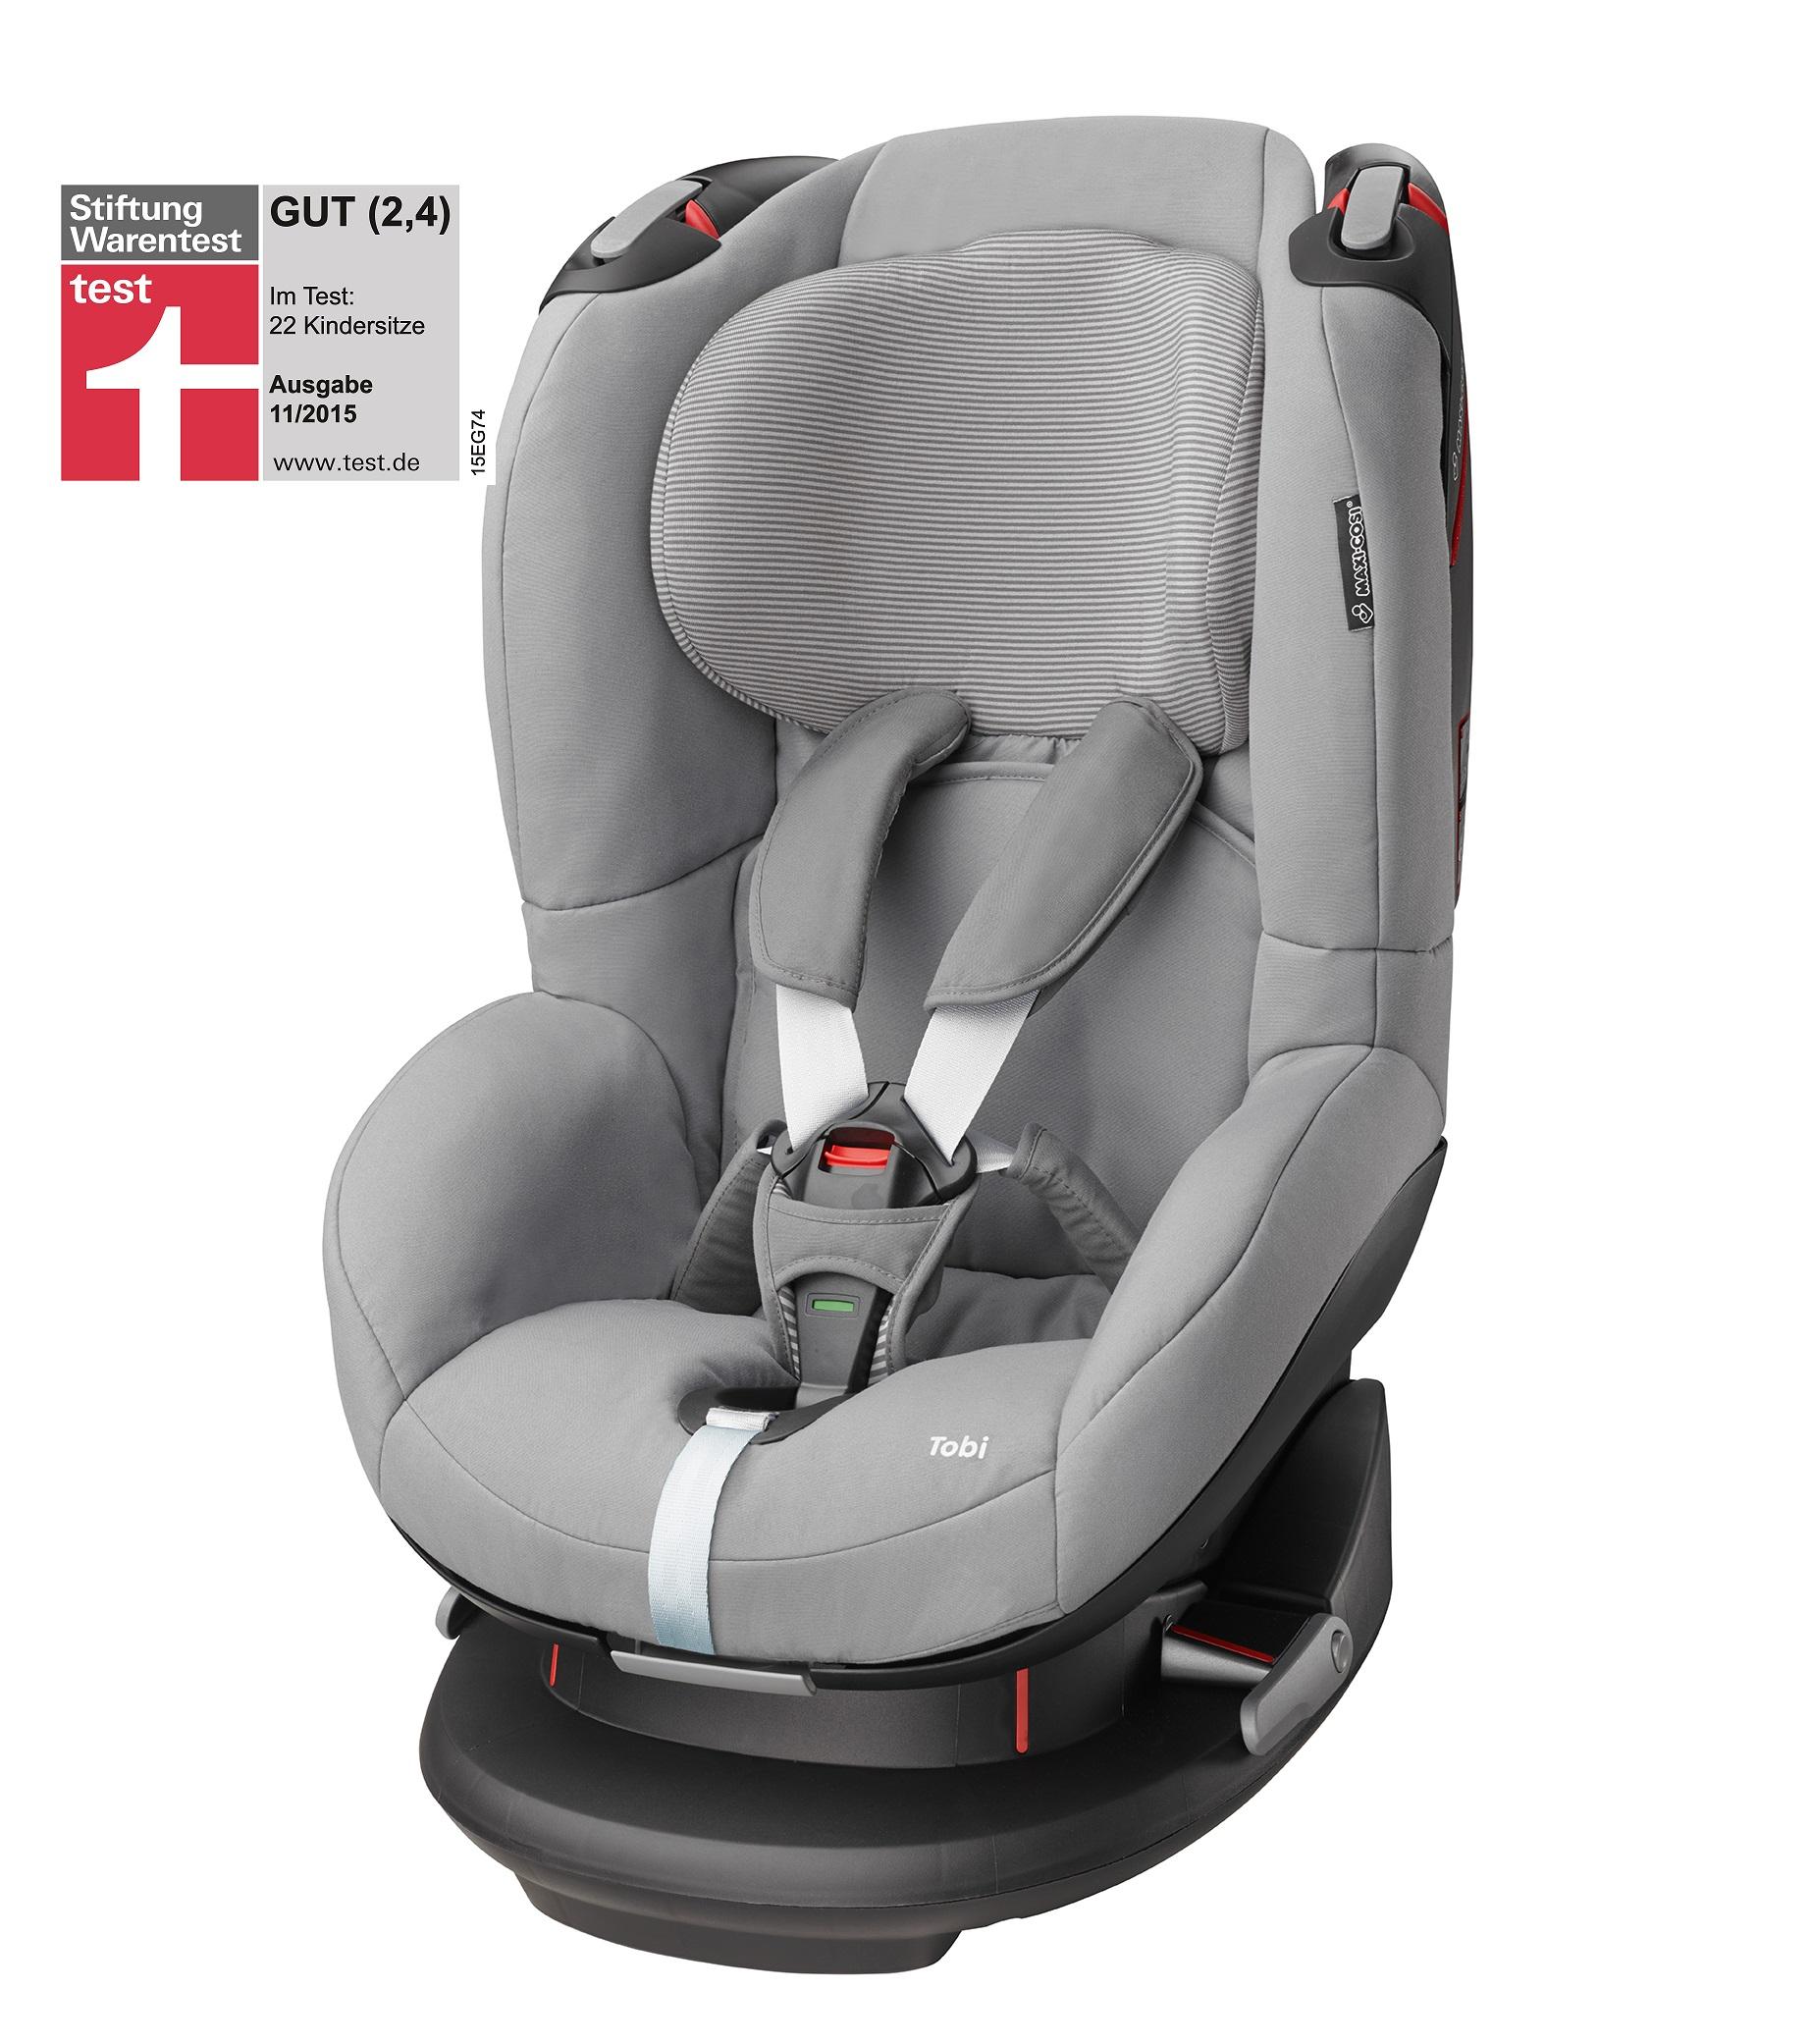 maxi cosi kindersitz tobi 2017 concrete grey online kaufen bei kidsroom kindersitze. Black Bedroom Furniture Sets. Home Design Ideas